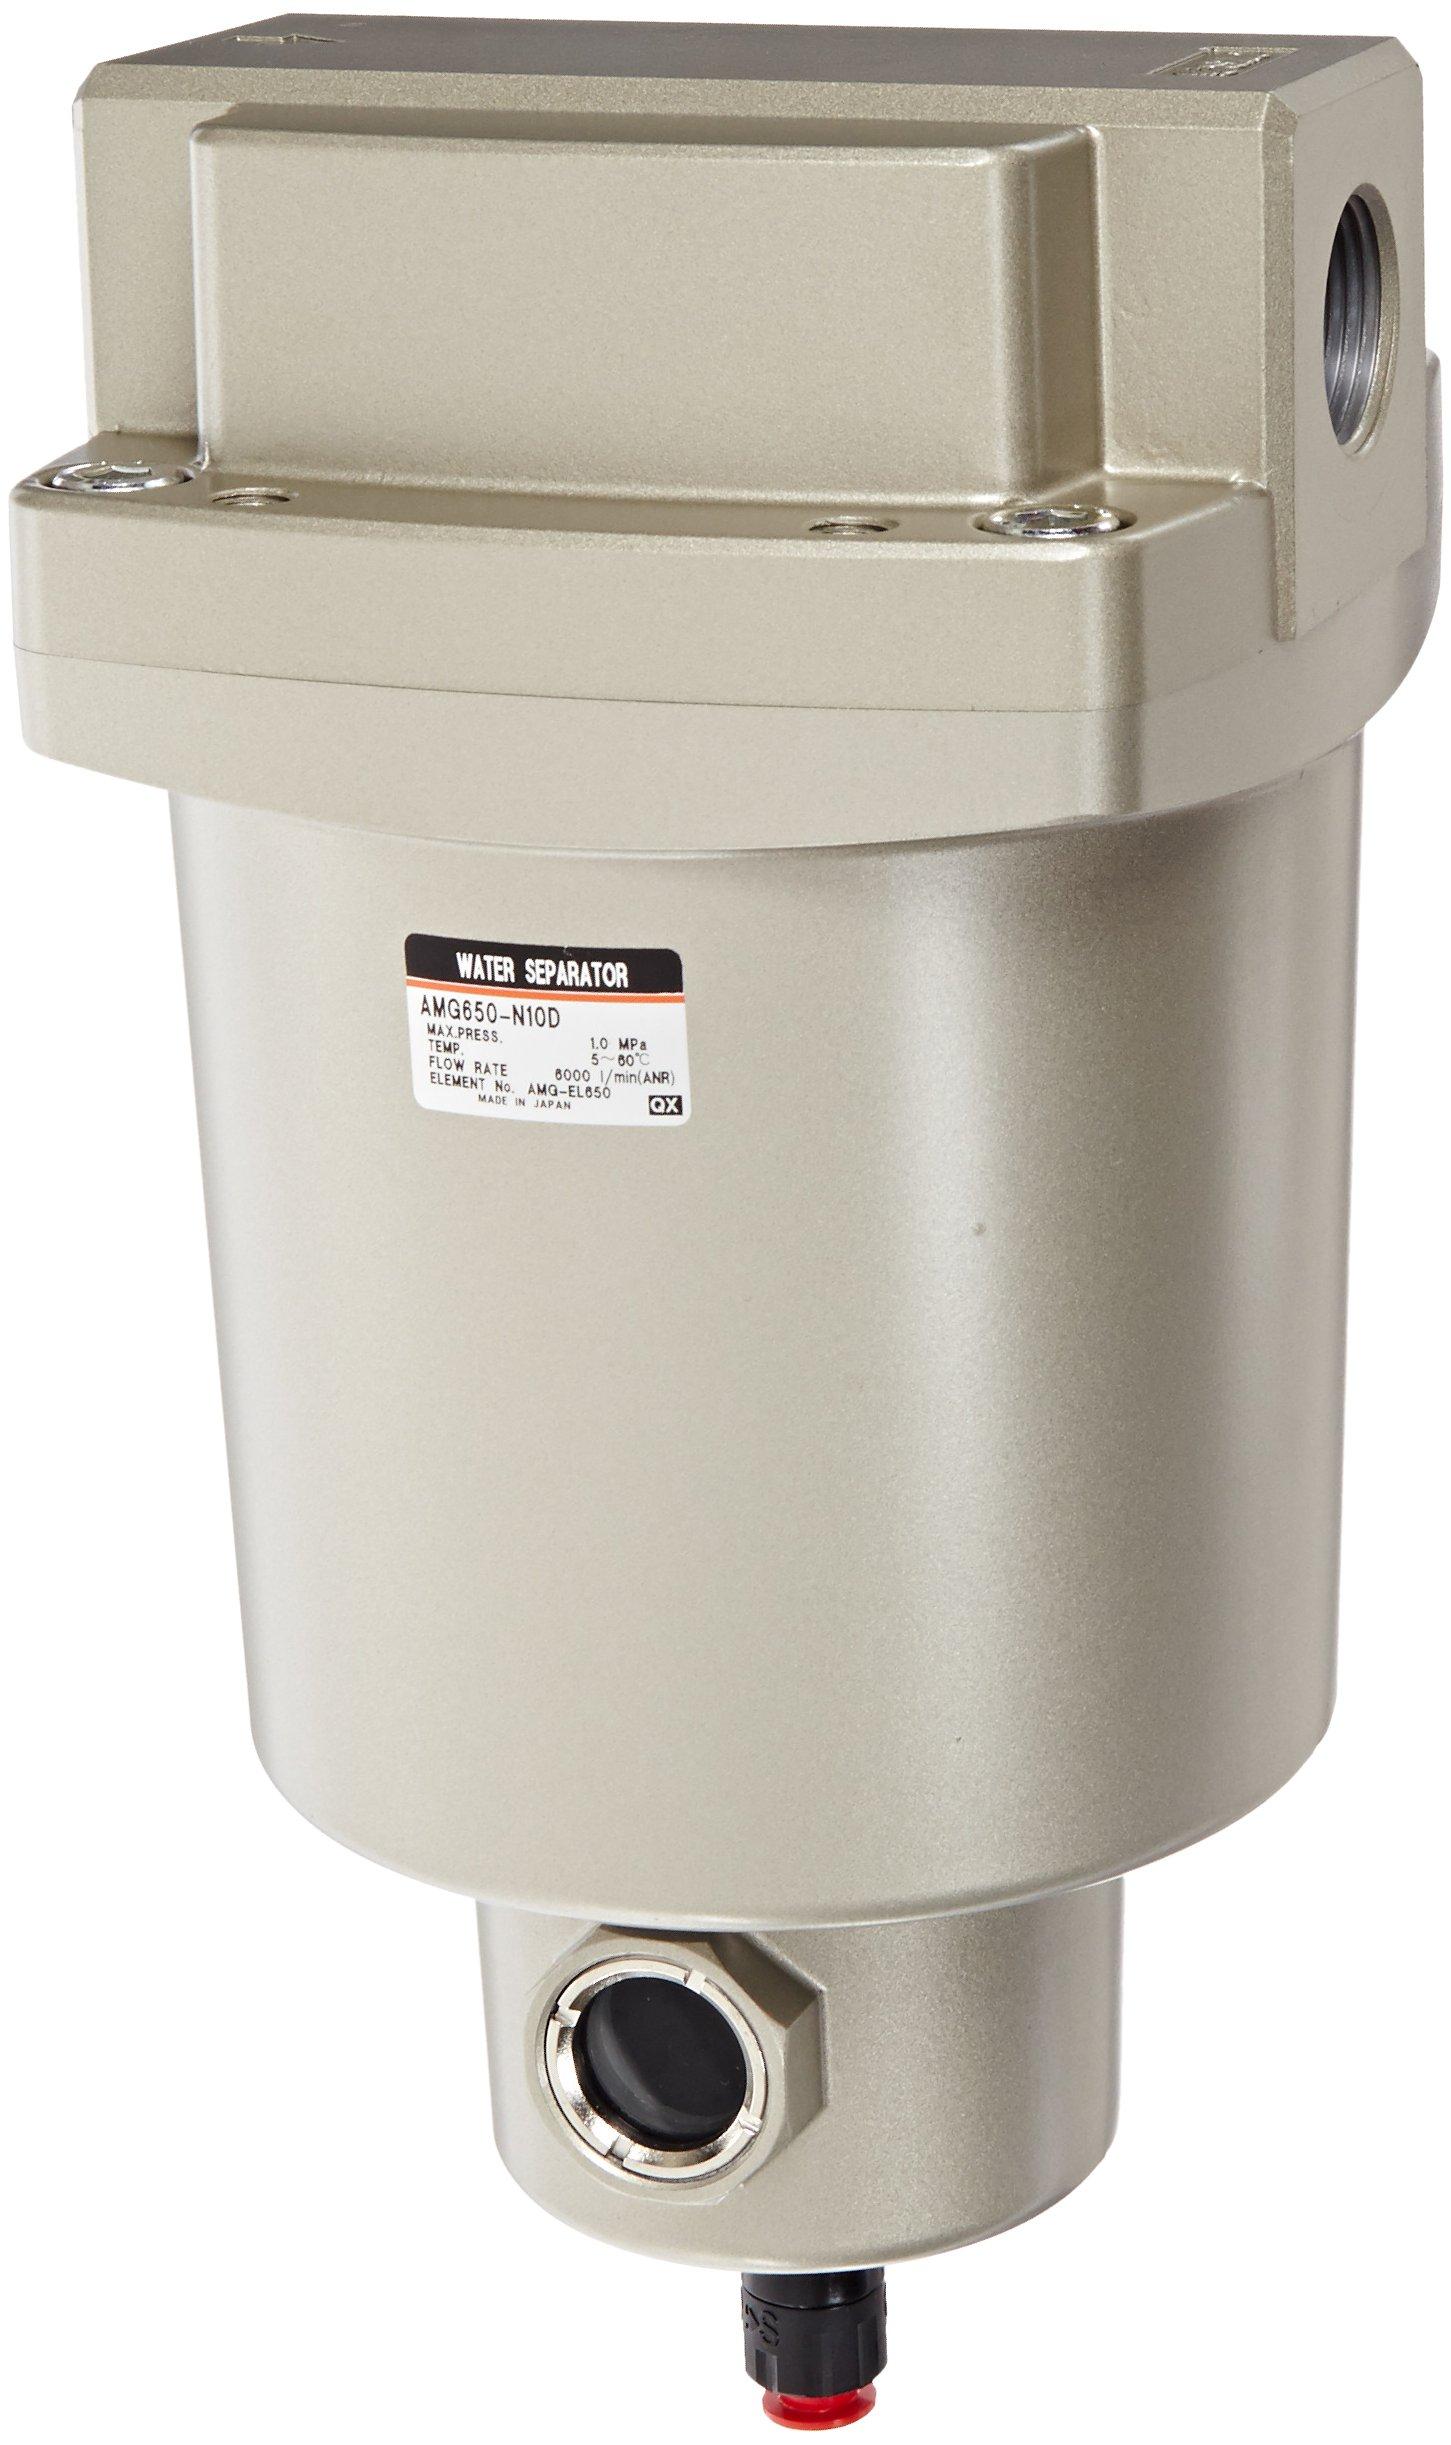 SMC AMG650-N10D Water Separator, N.O. Auto Drain, 6,000 L/min, 1'' NPT